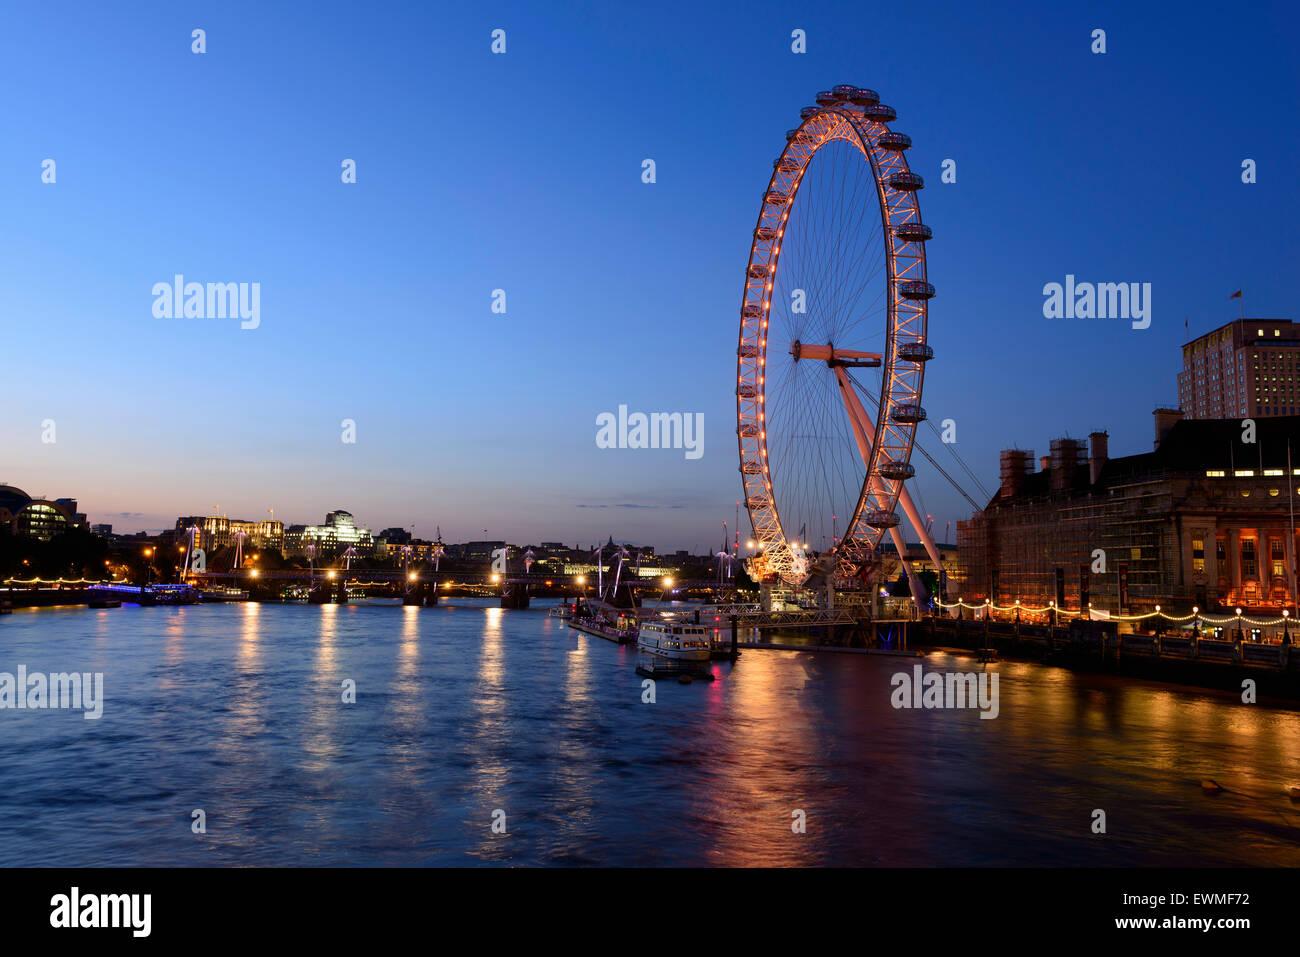 London Eye, grande roue du millénaire, Londres, Angleterre, Royaume-Uni Photo Stock